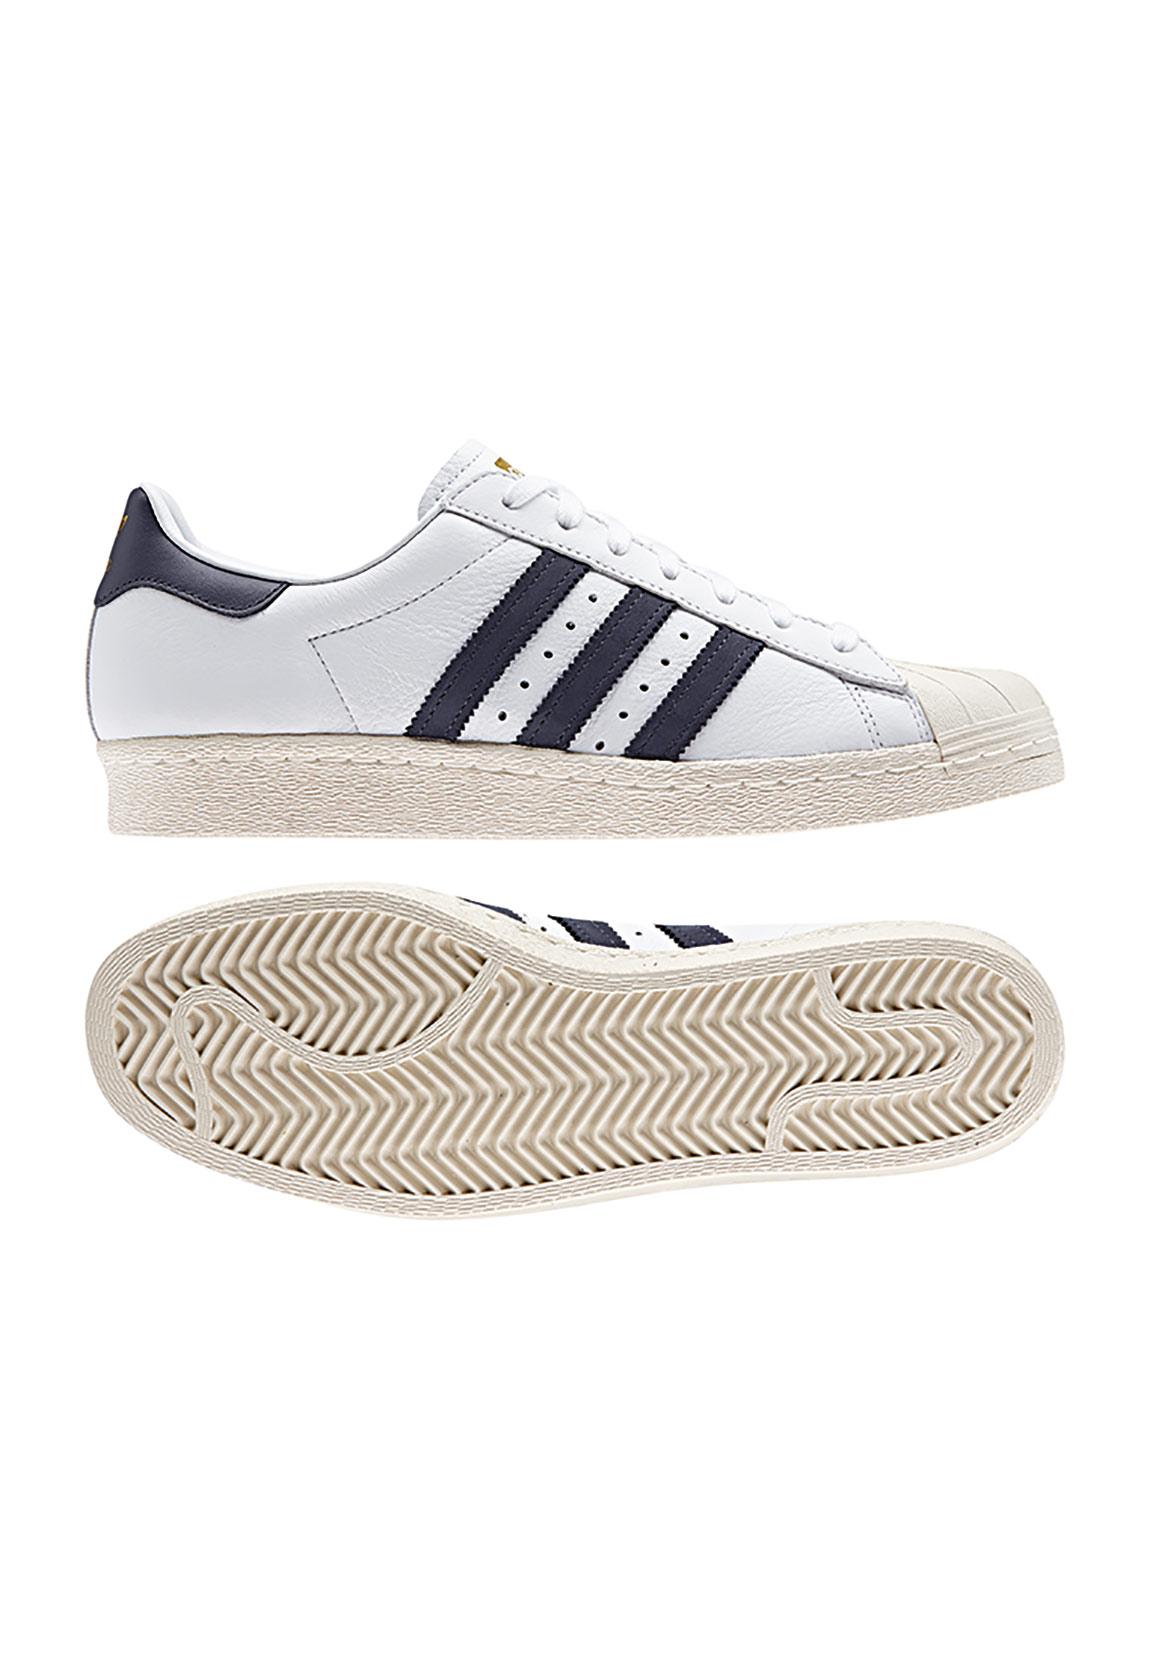 82130365b9b840 Adidas Sneaker SUPERSTAR 80S BZ0145 Weiß Dunkelblau Schuhe Herren